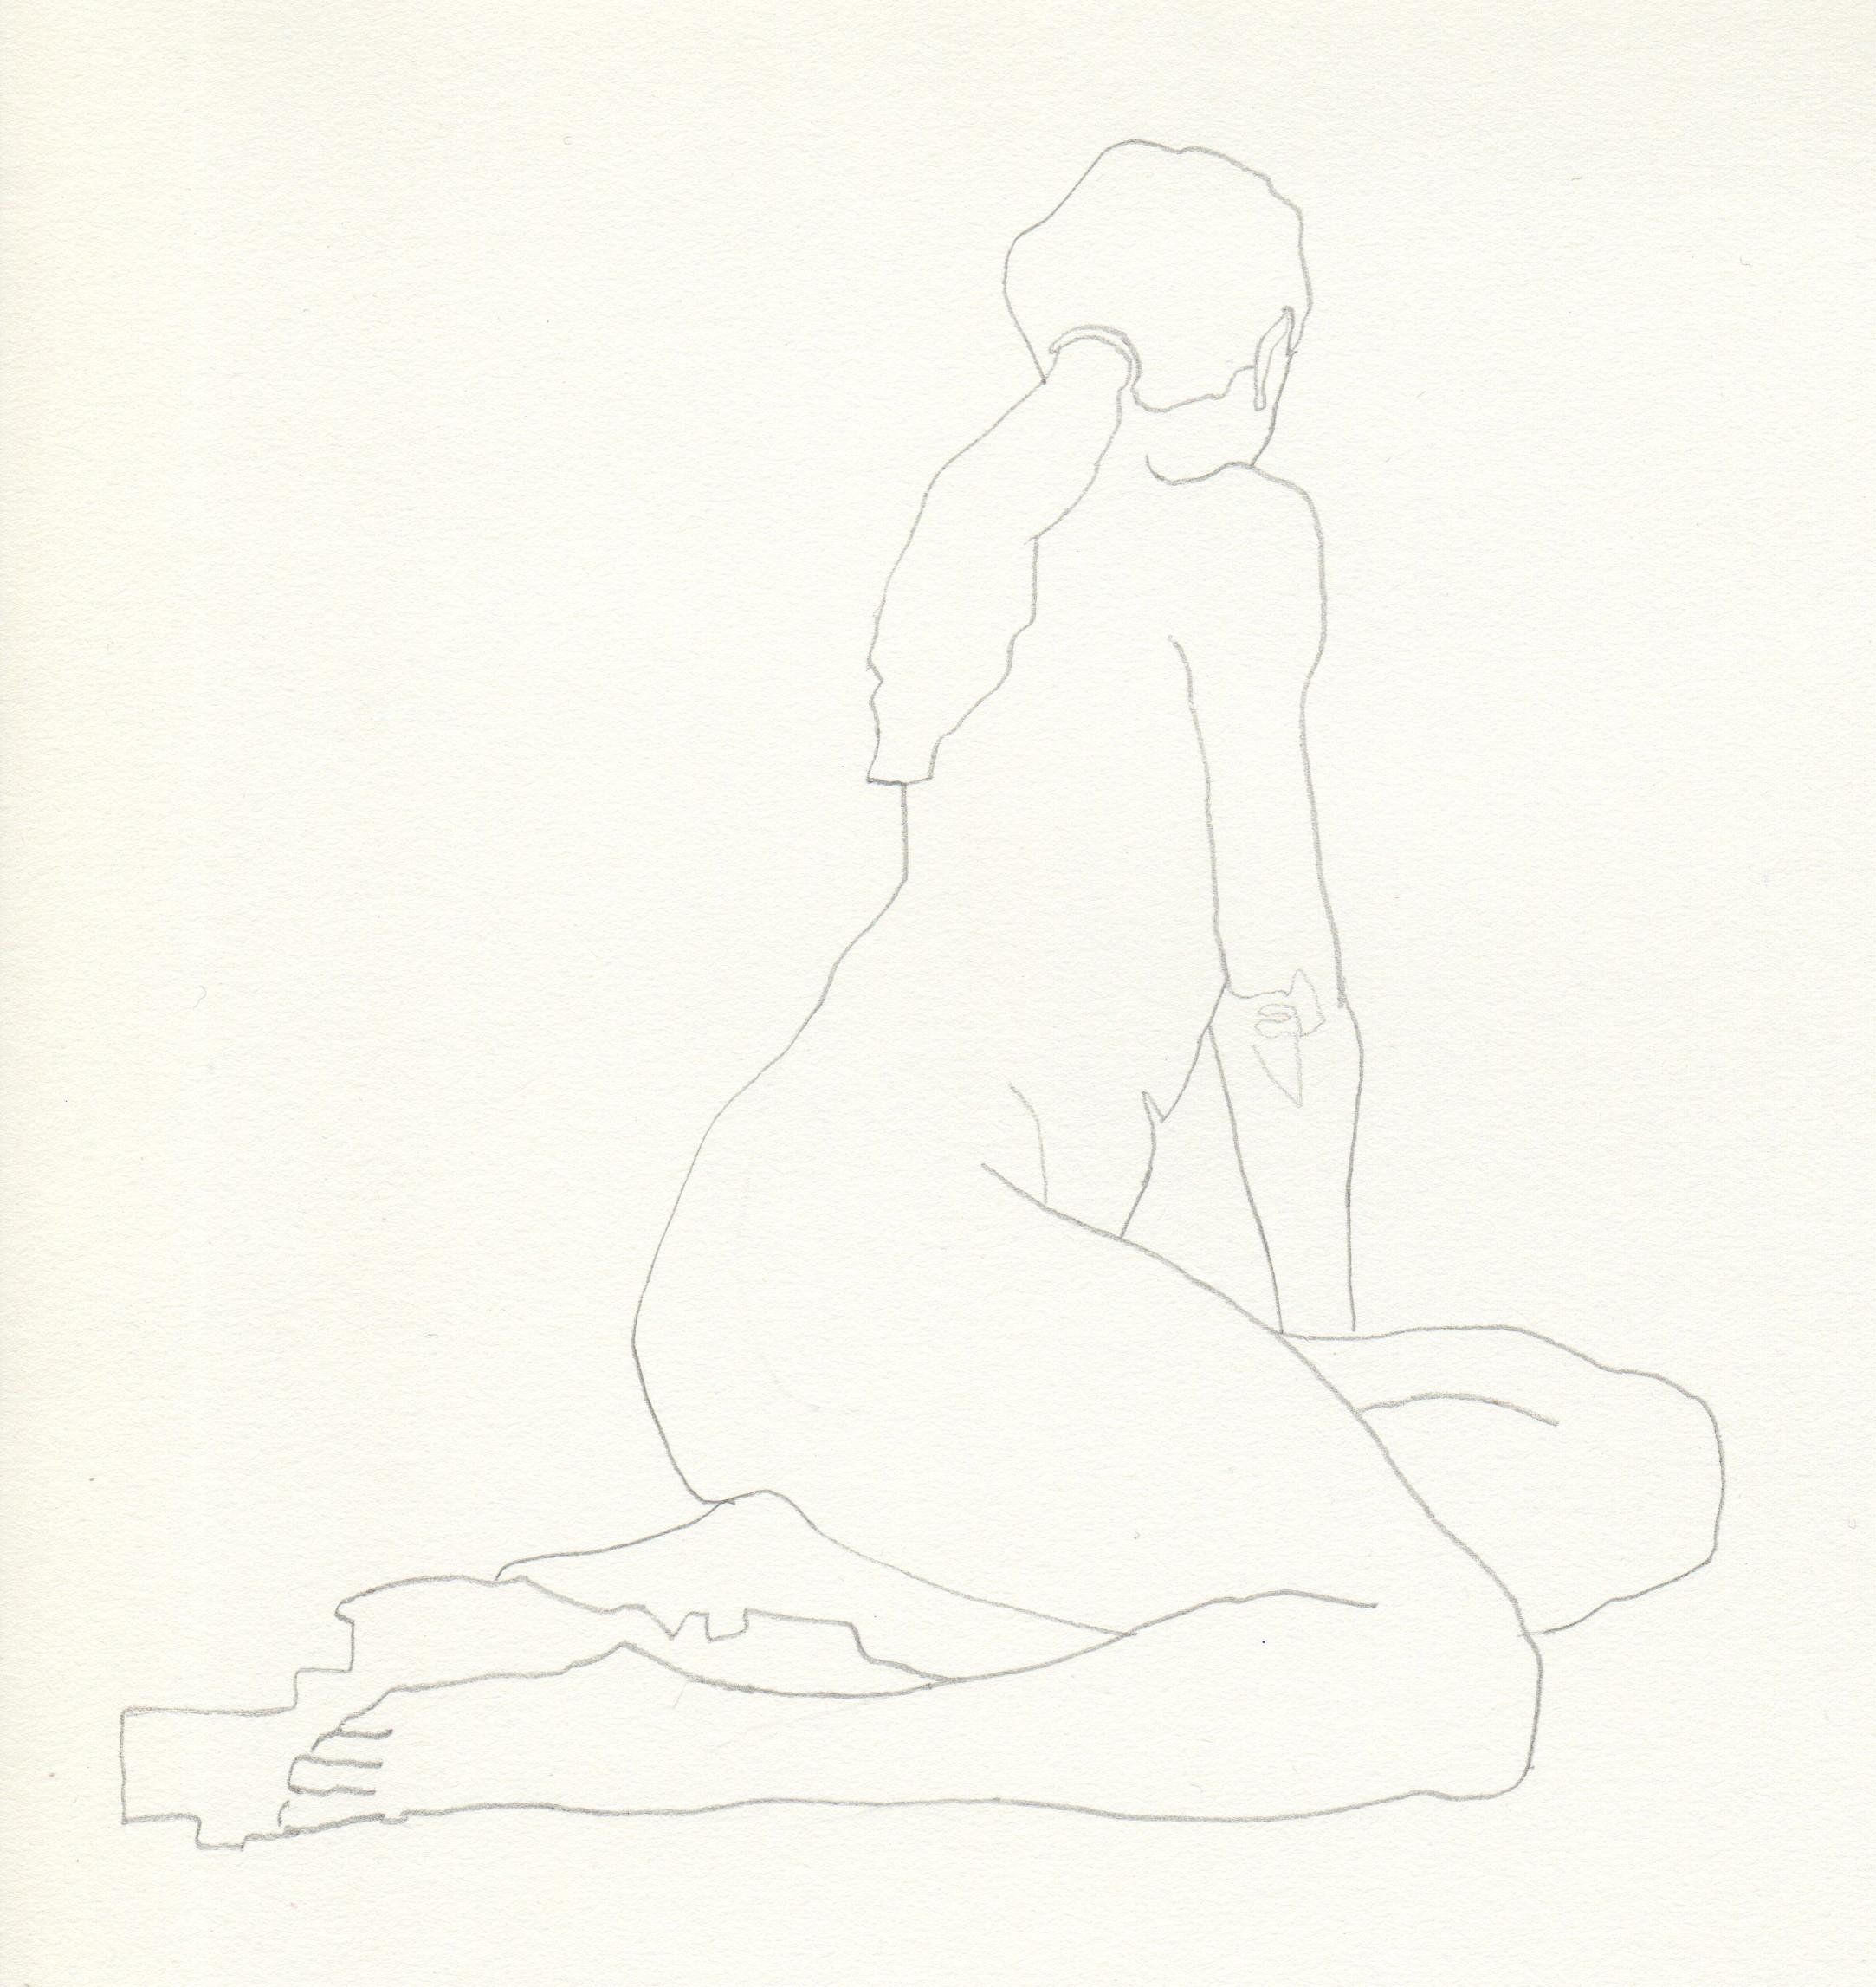 2012_Sketch_F-Beudin_060